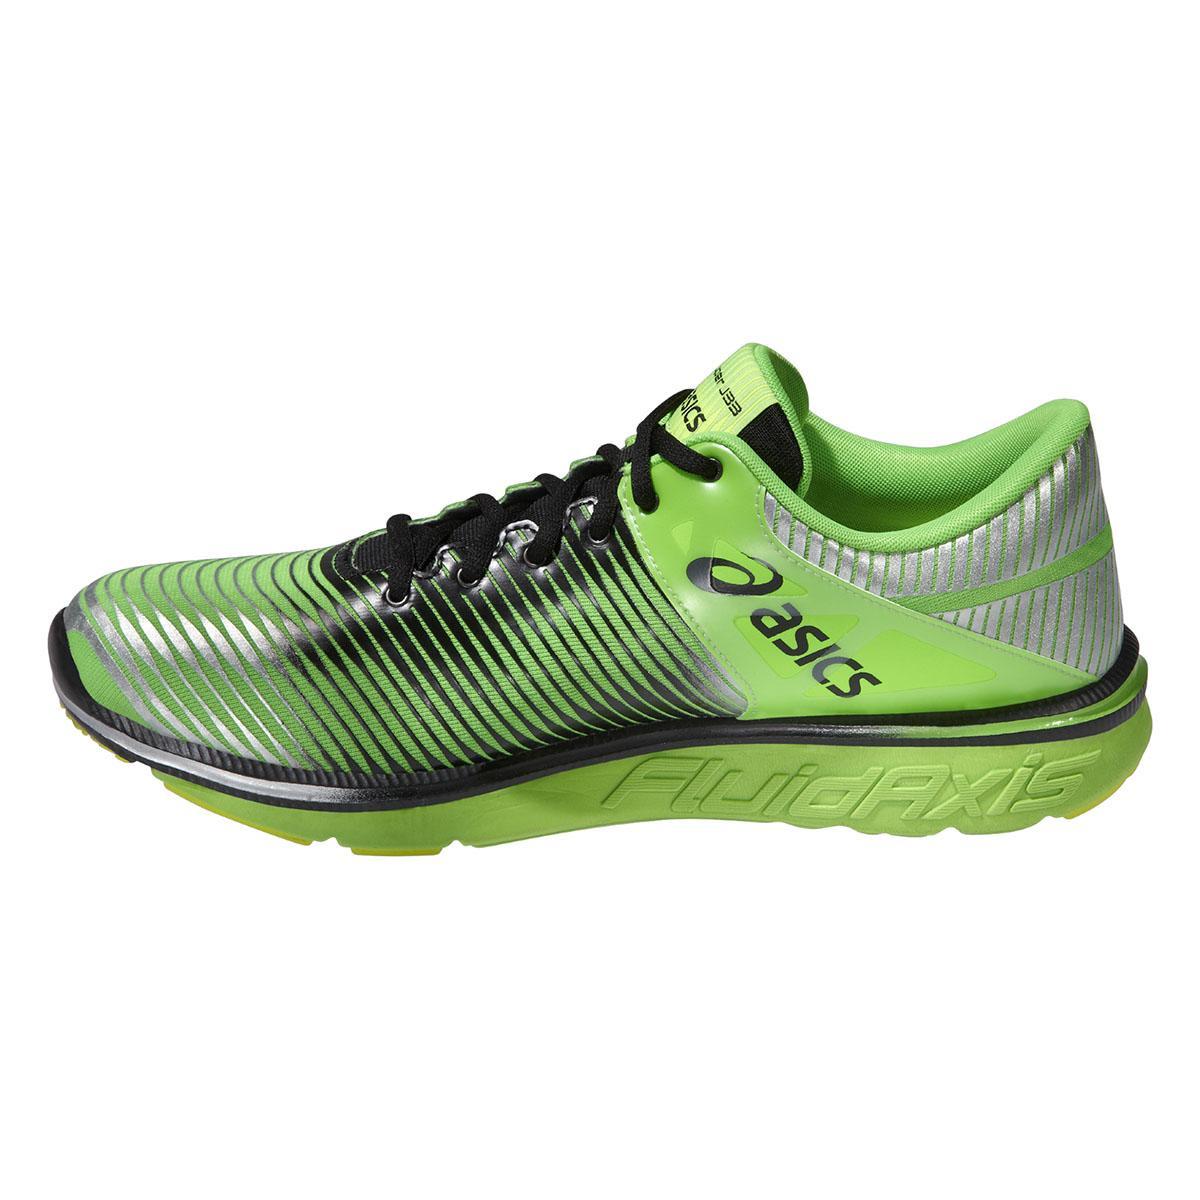 Asics Mens GEL-Super J33 Running Shoes - Flash Green/Onyx/Silver - Tennisnuts.com